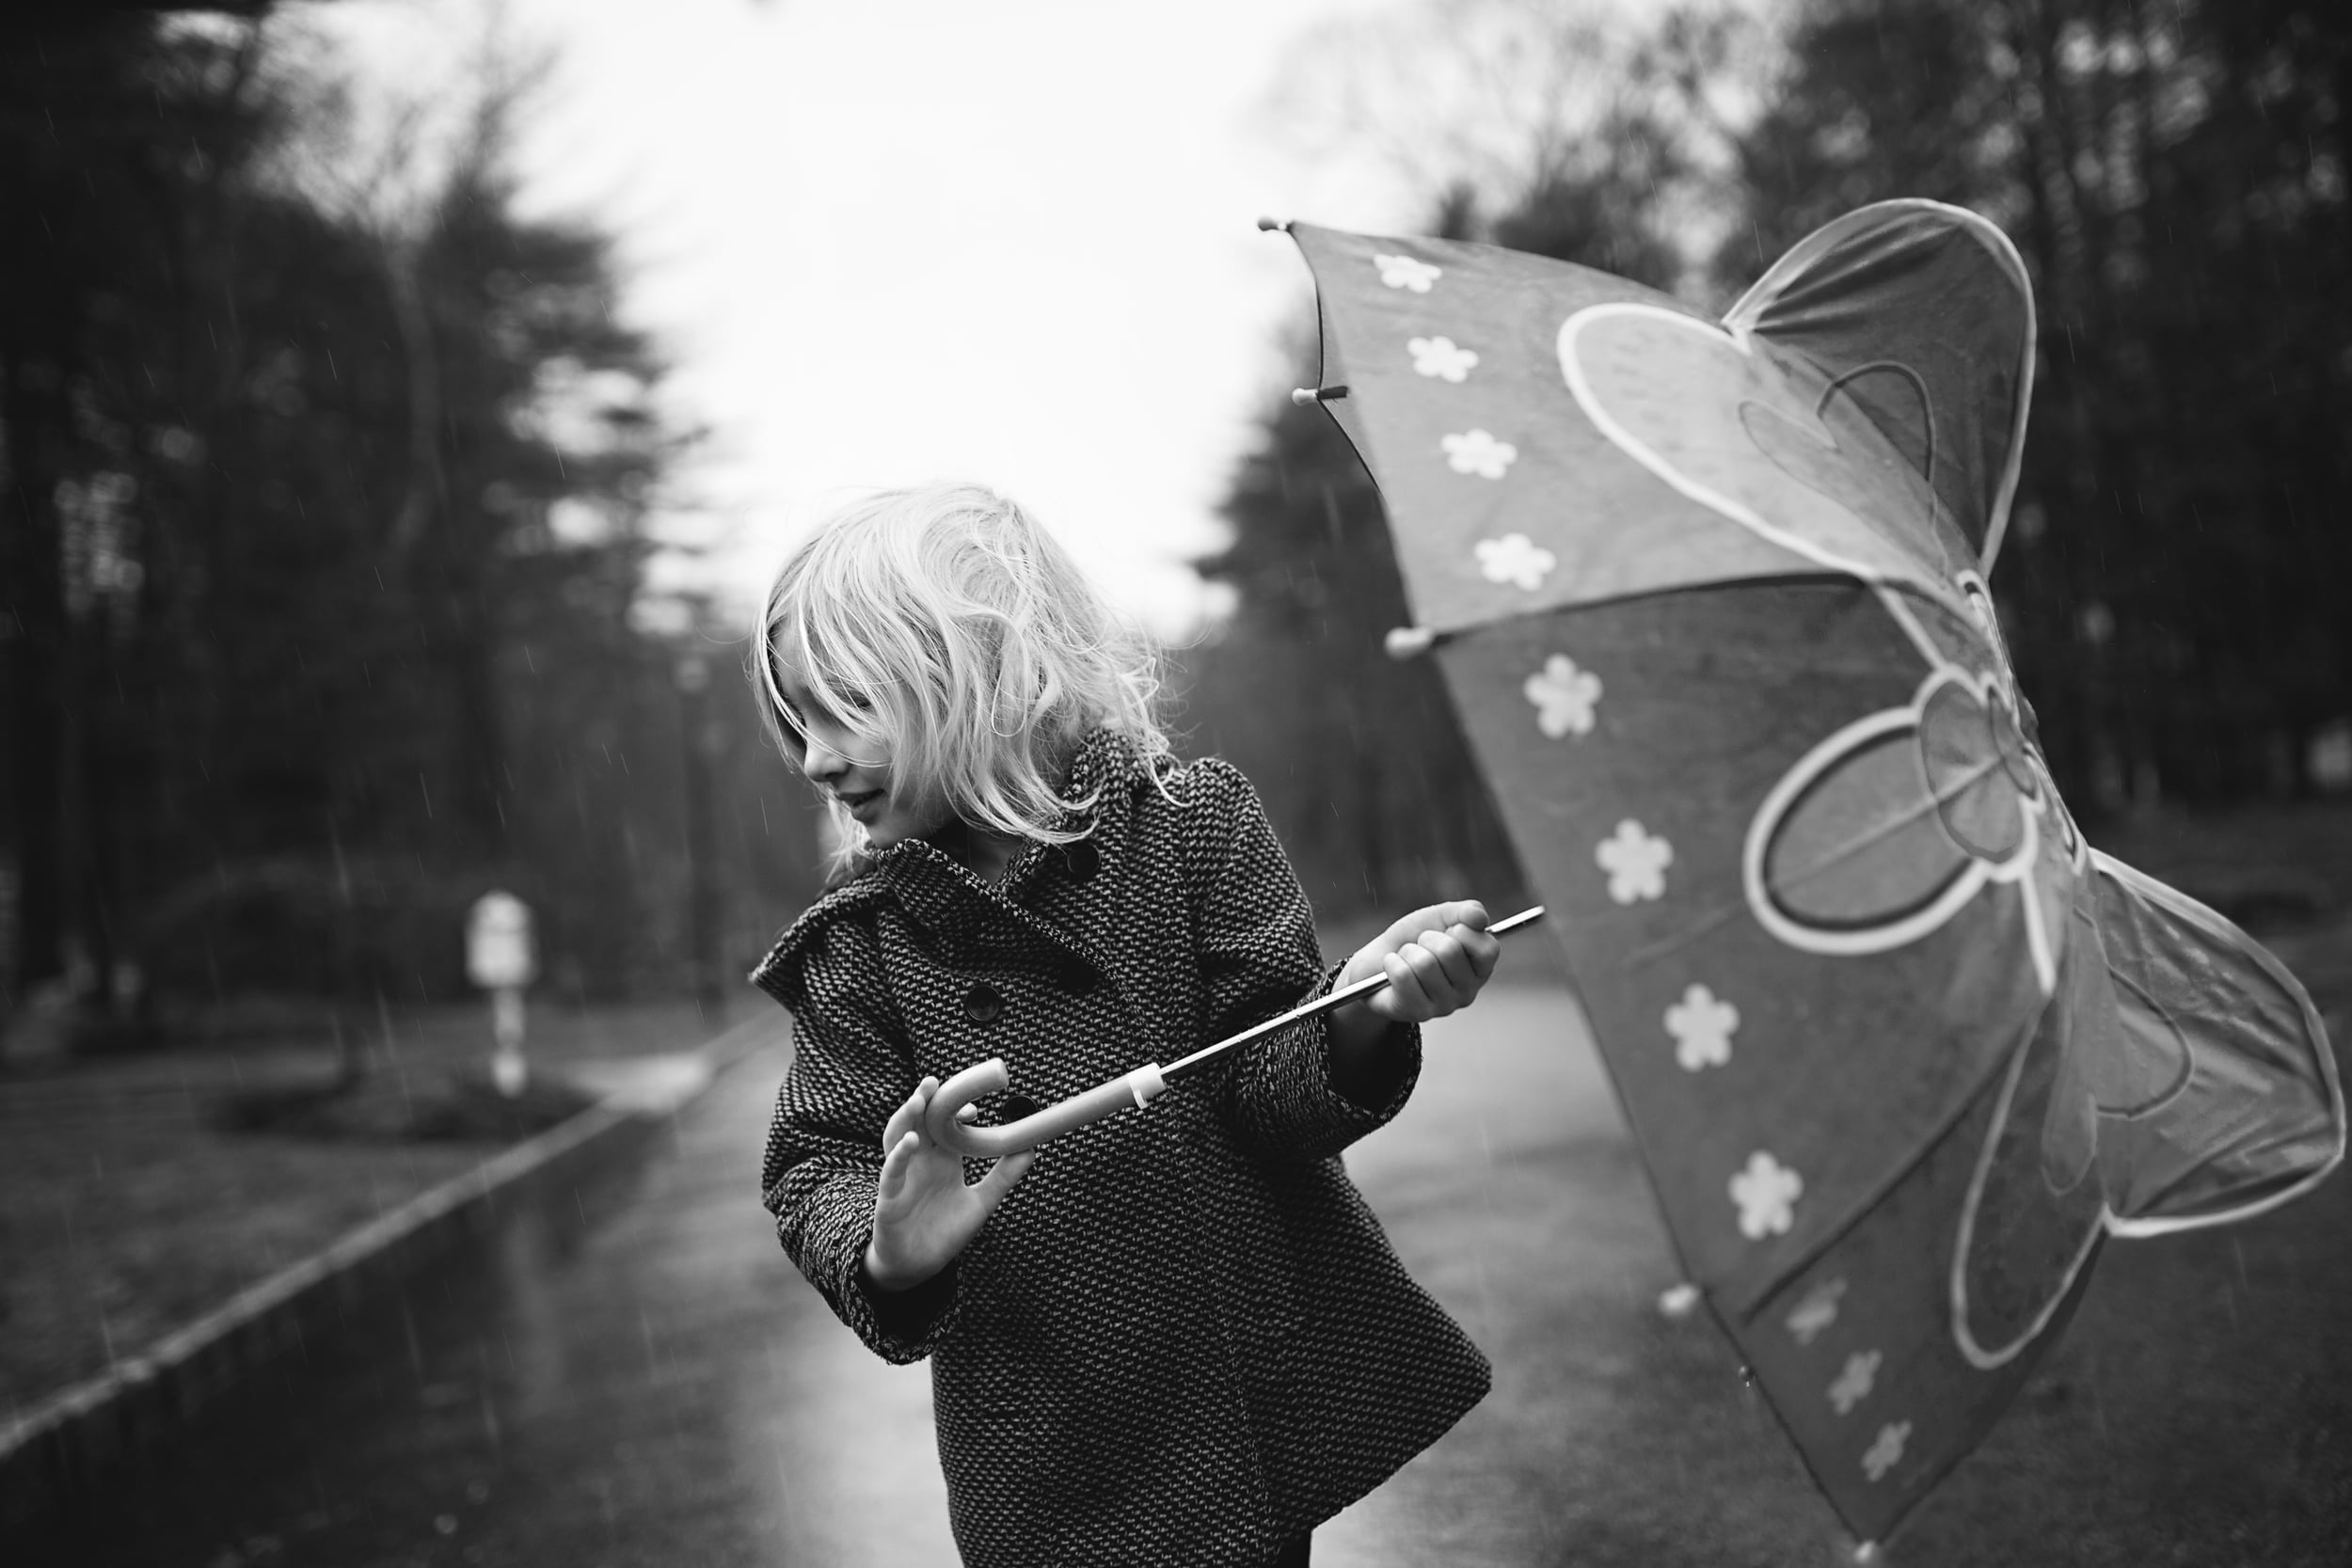 10/366 - Playing in the rain